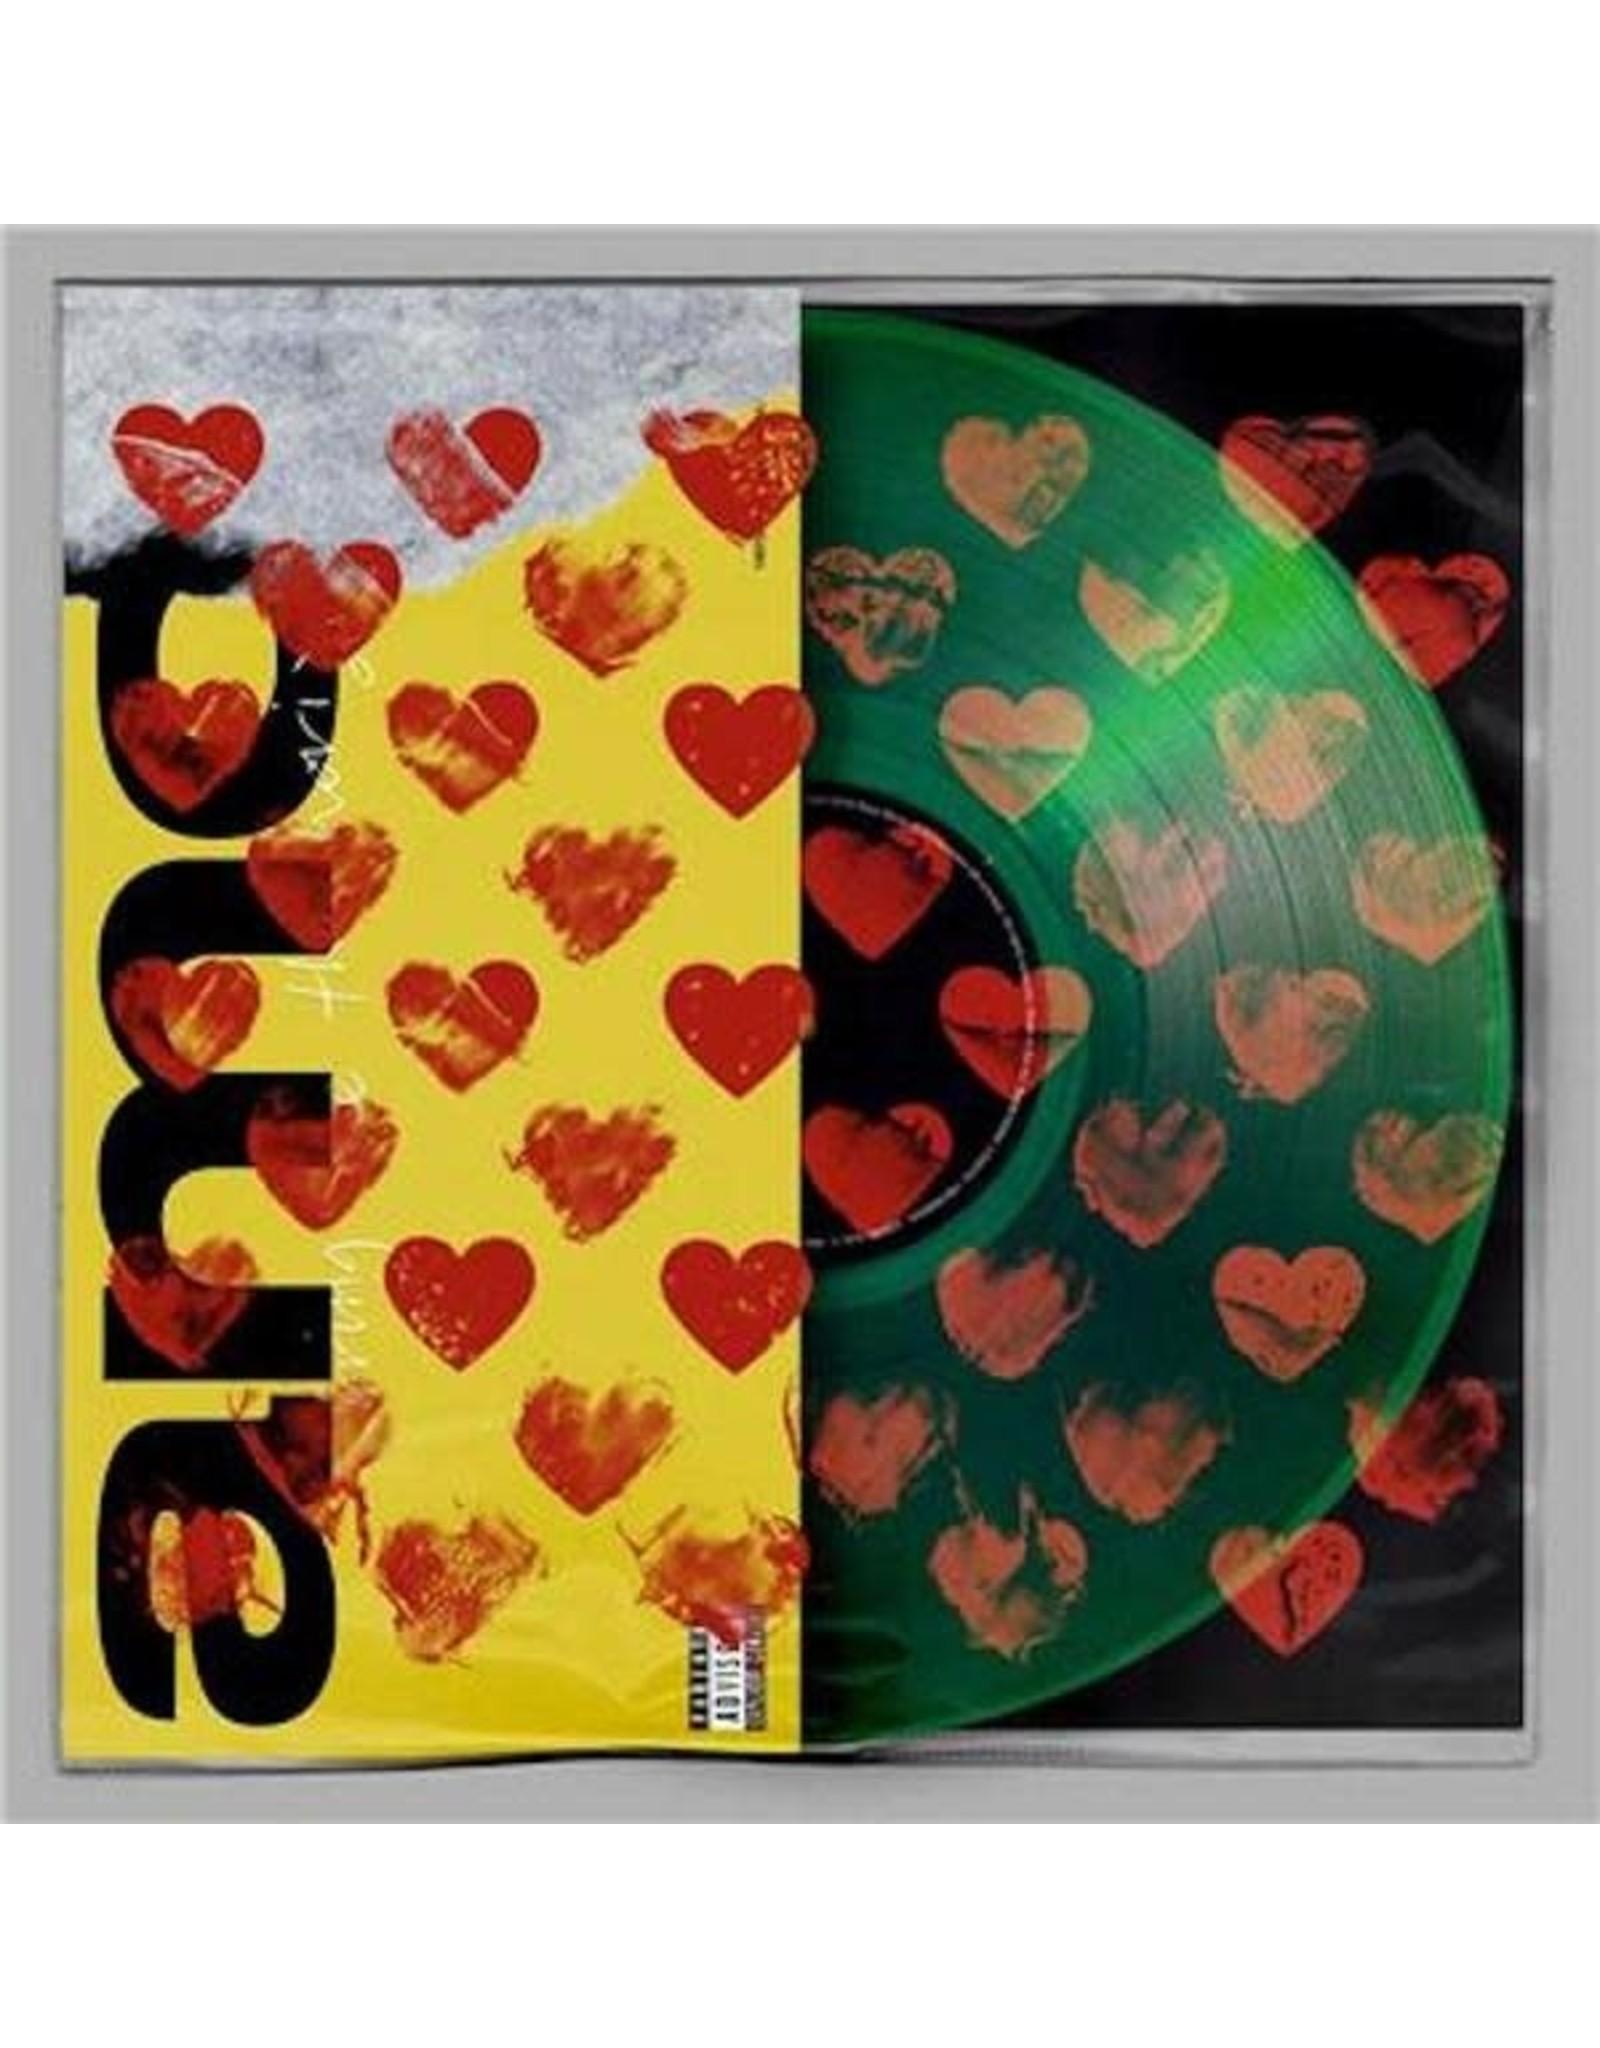 Bring Me The Horizon - Amo (Green Vinyl)